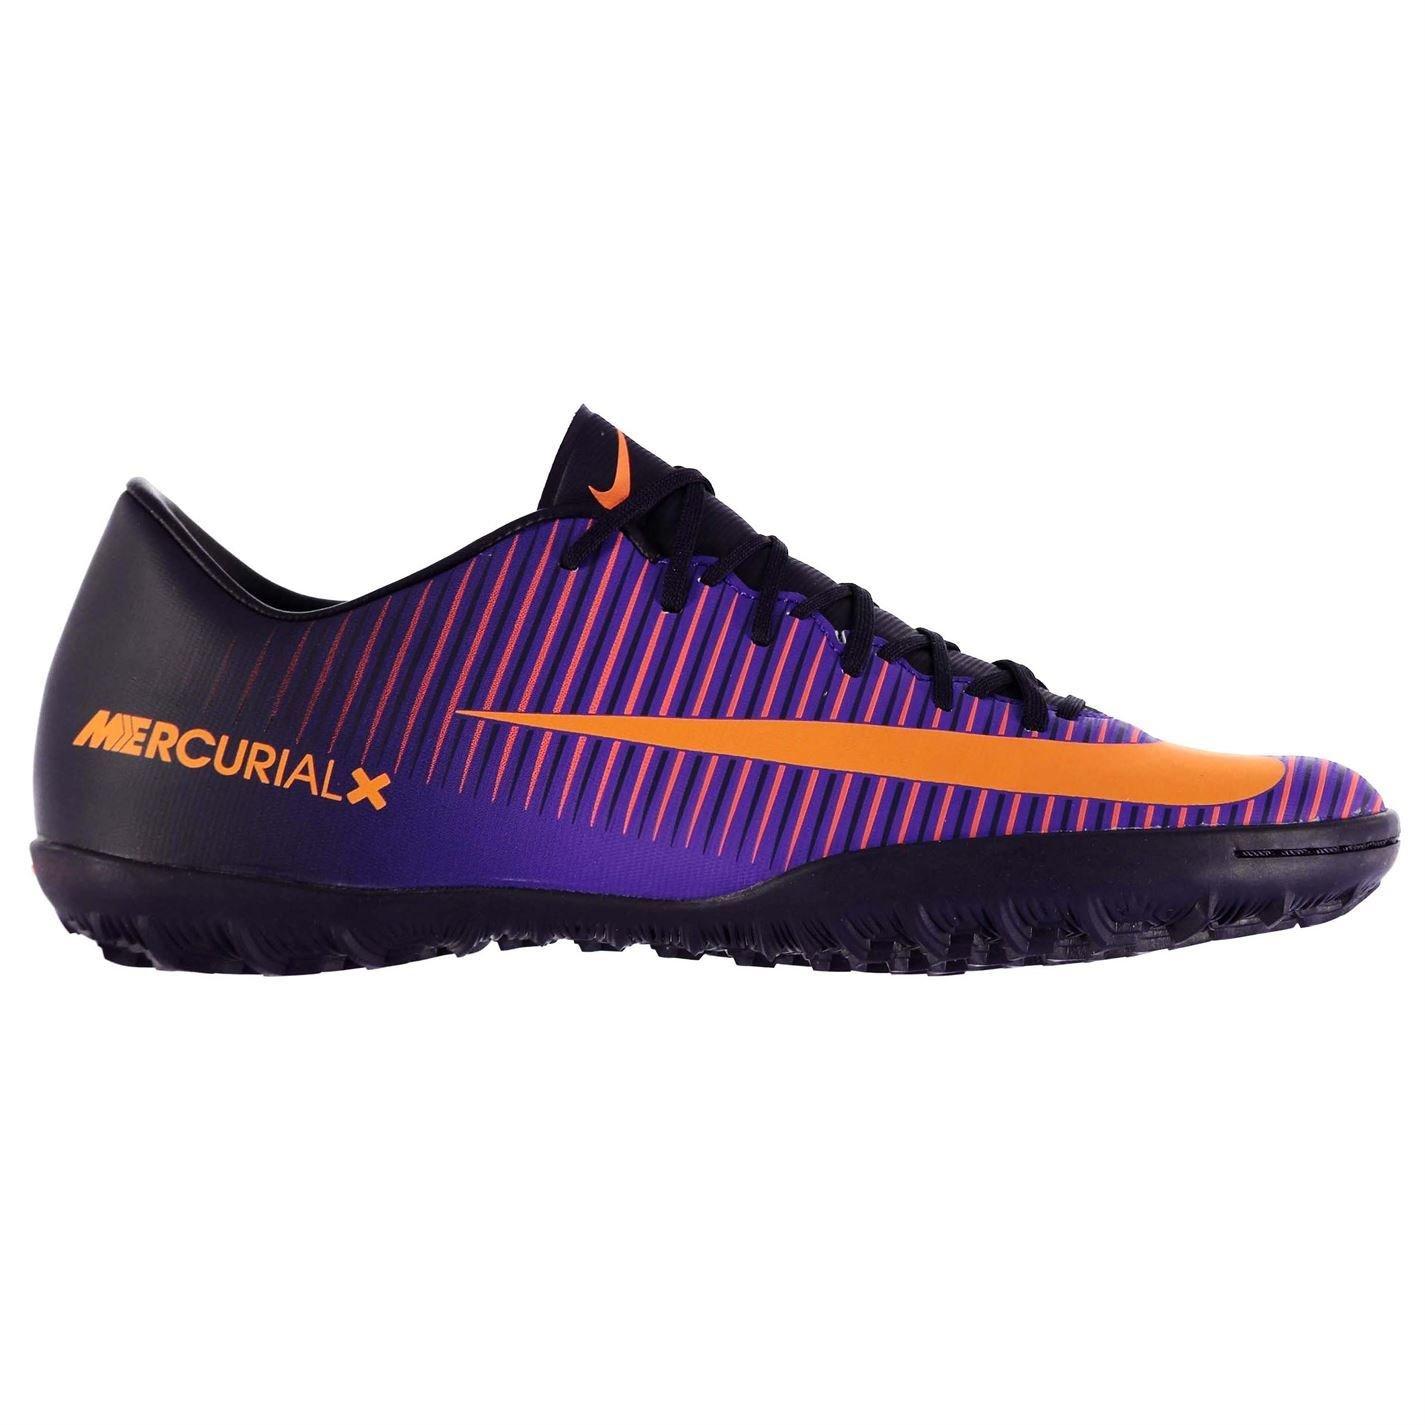 Adidasi Nike Mercurial Victory VI Astro Turf 00054